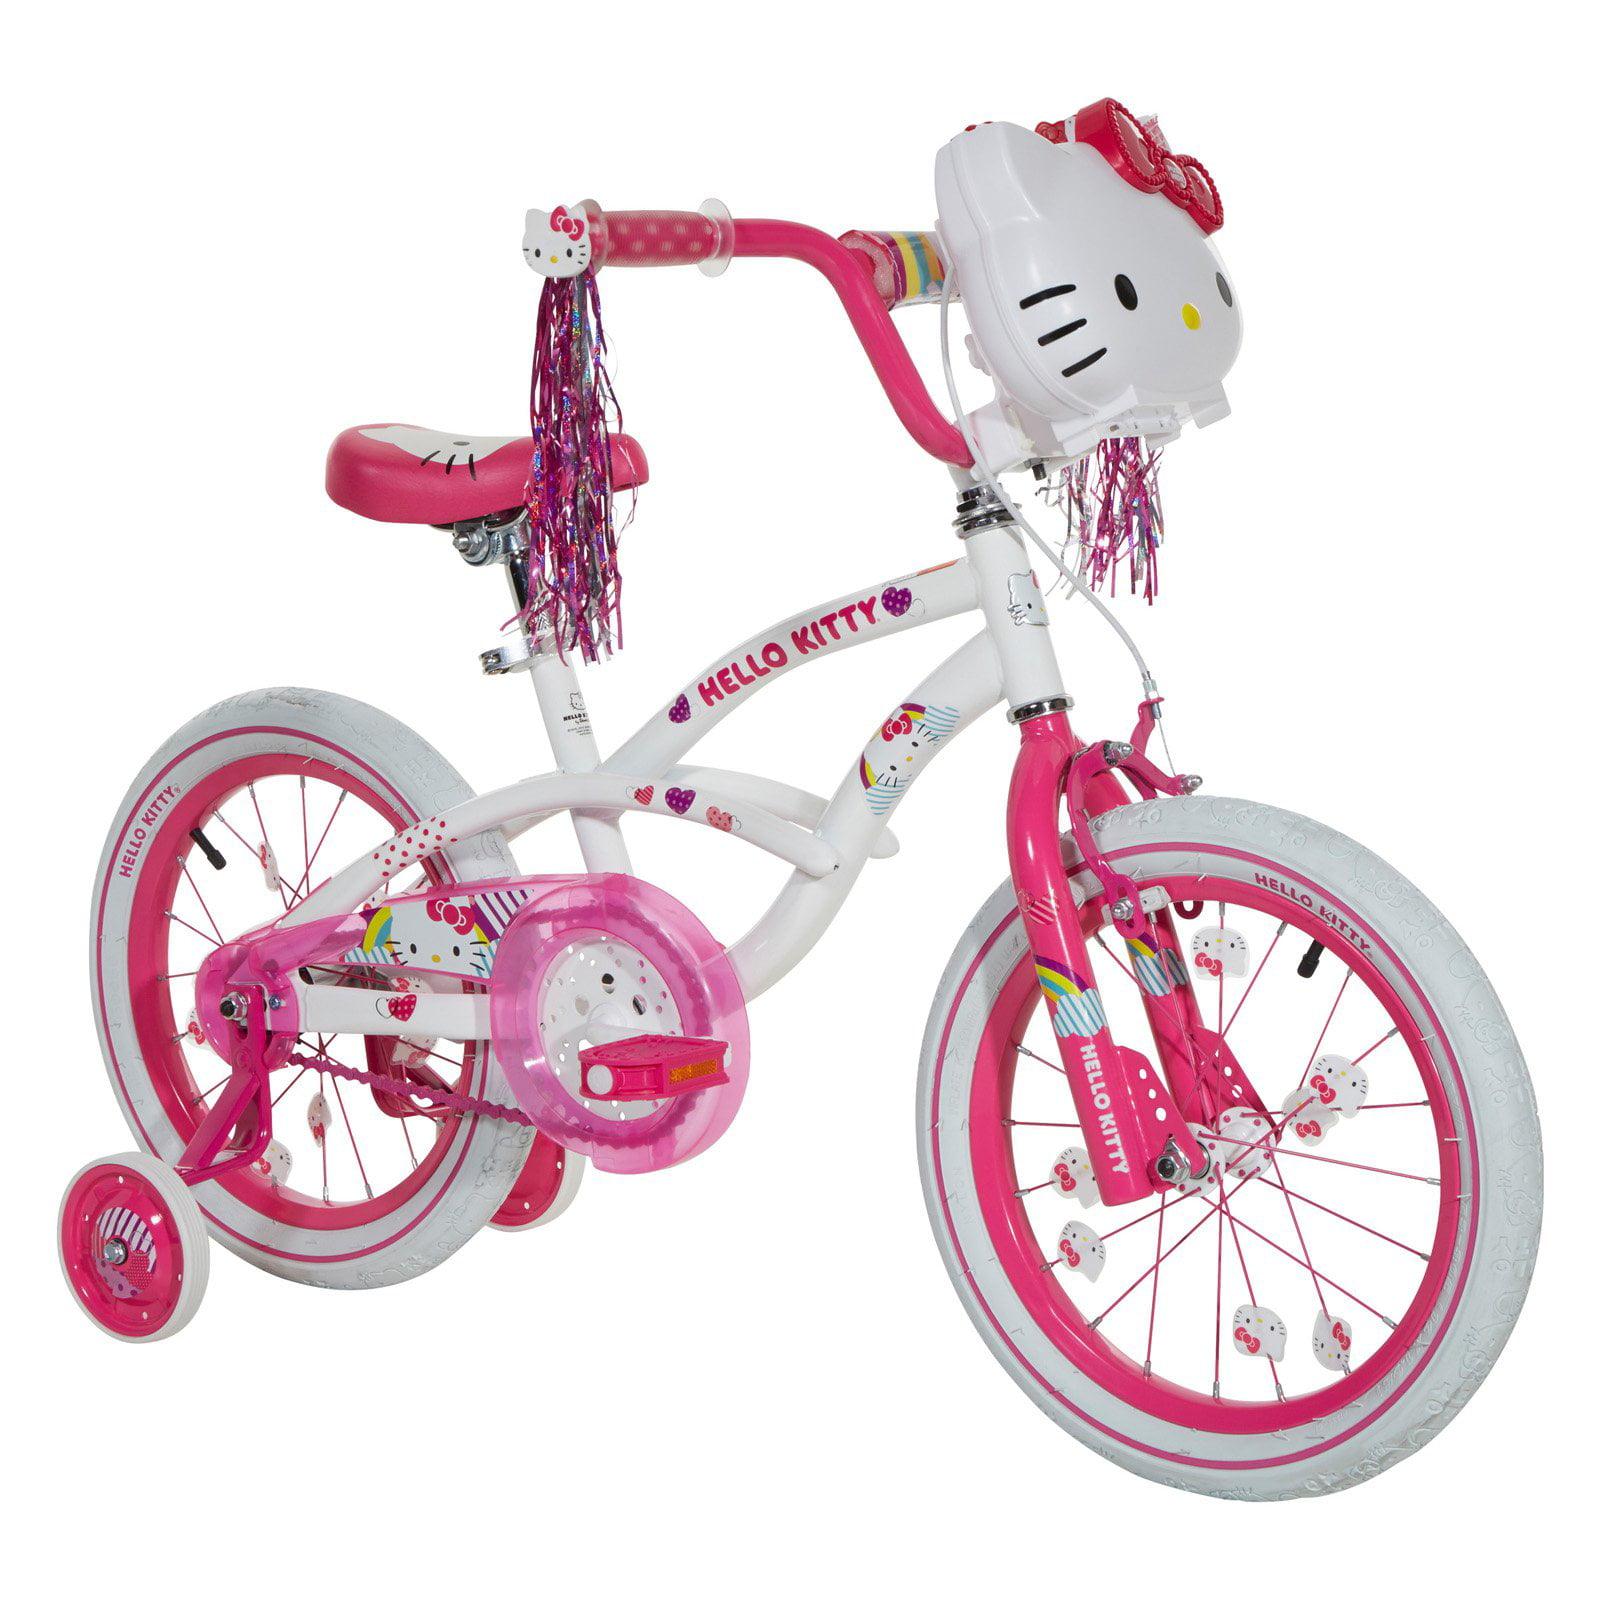 "Dynacraft 16"" Girls' Hello Kitty Bike by Dynacraft"